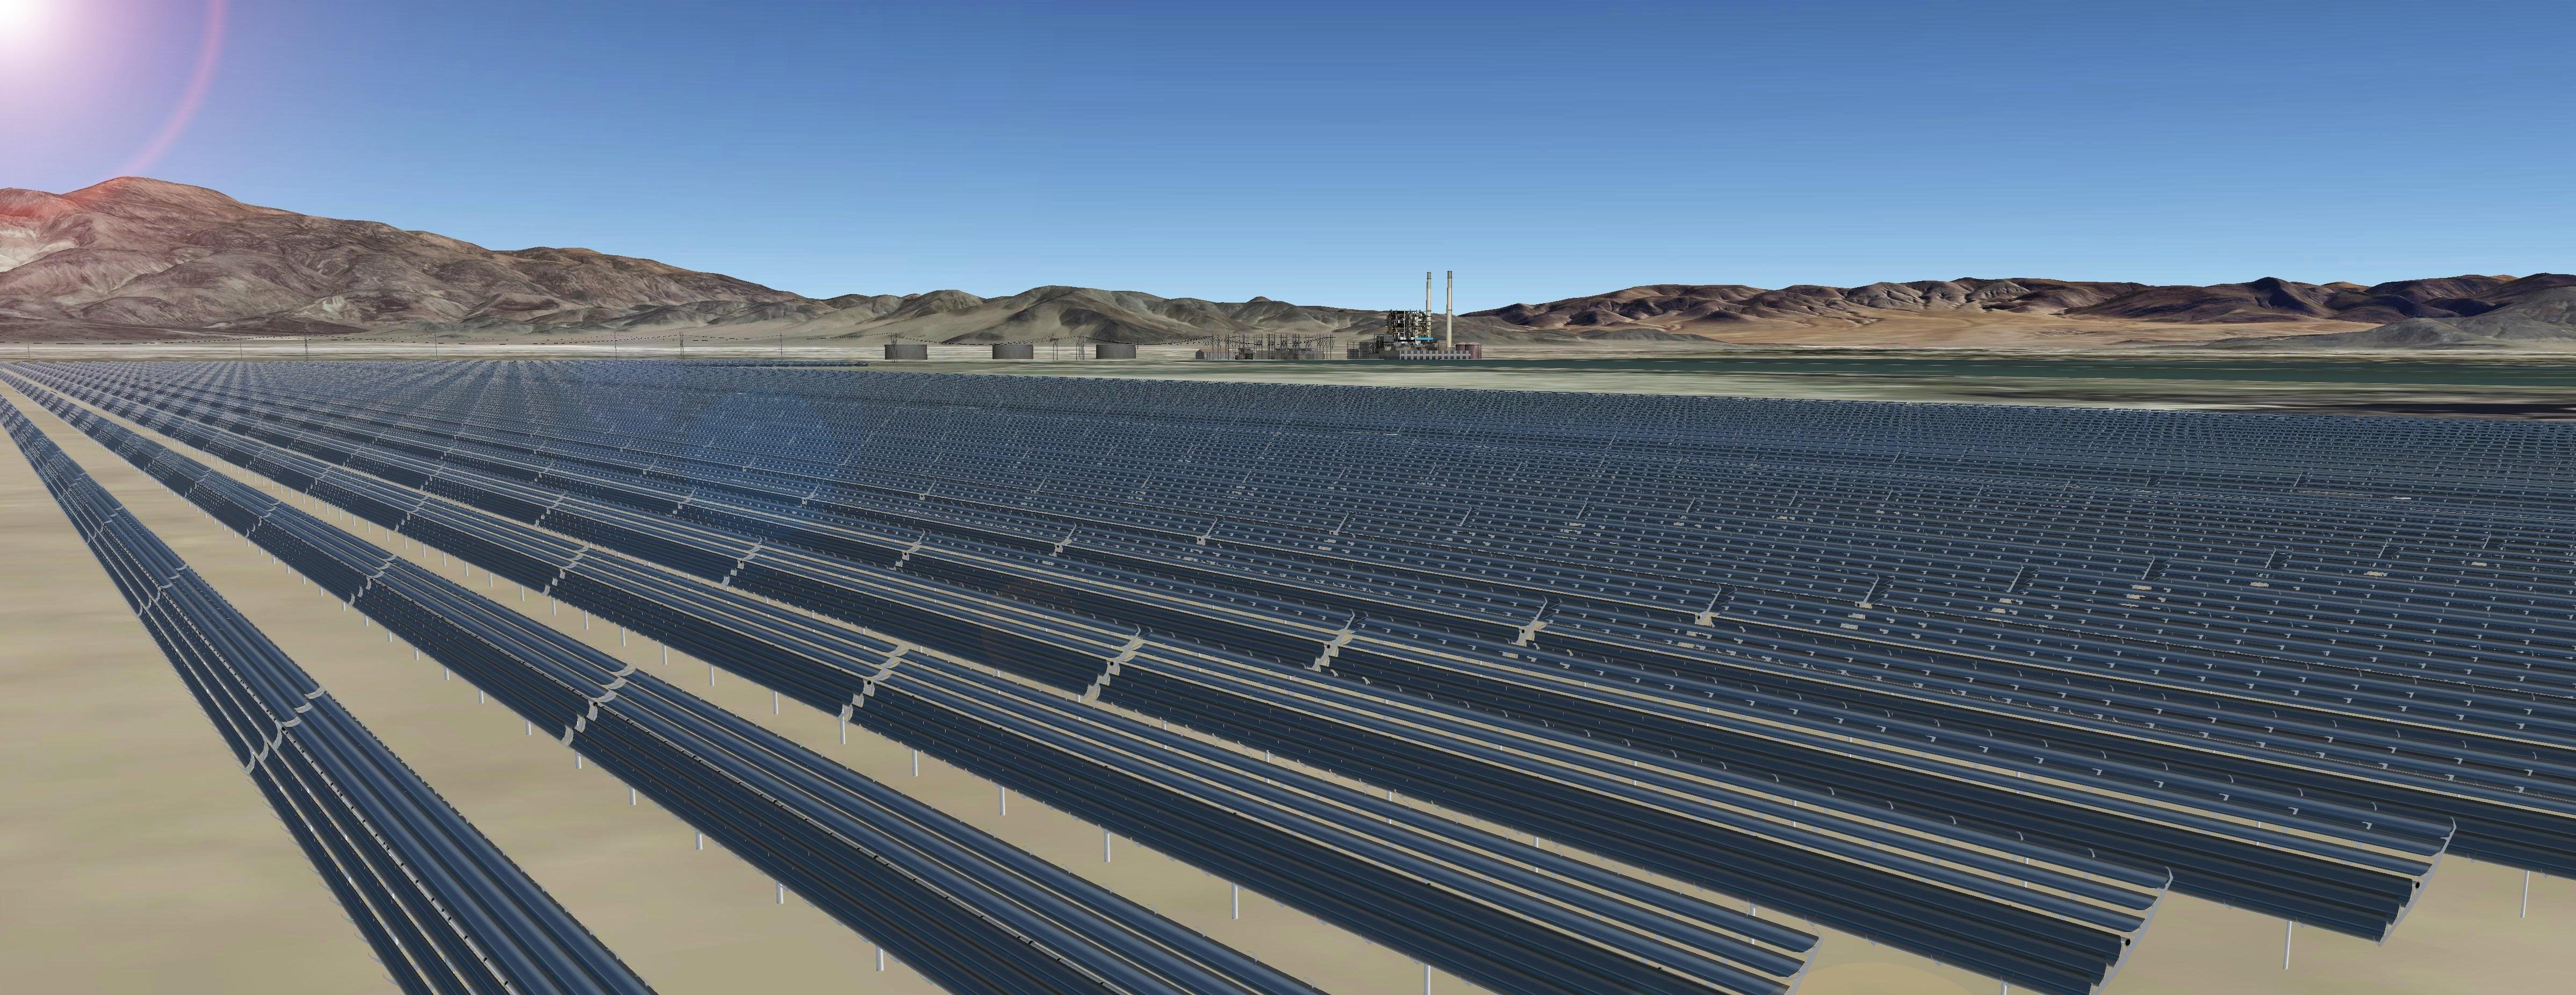 Apple solar farm in Reno